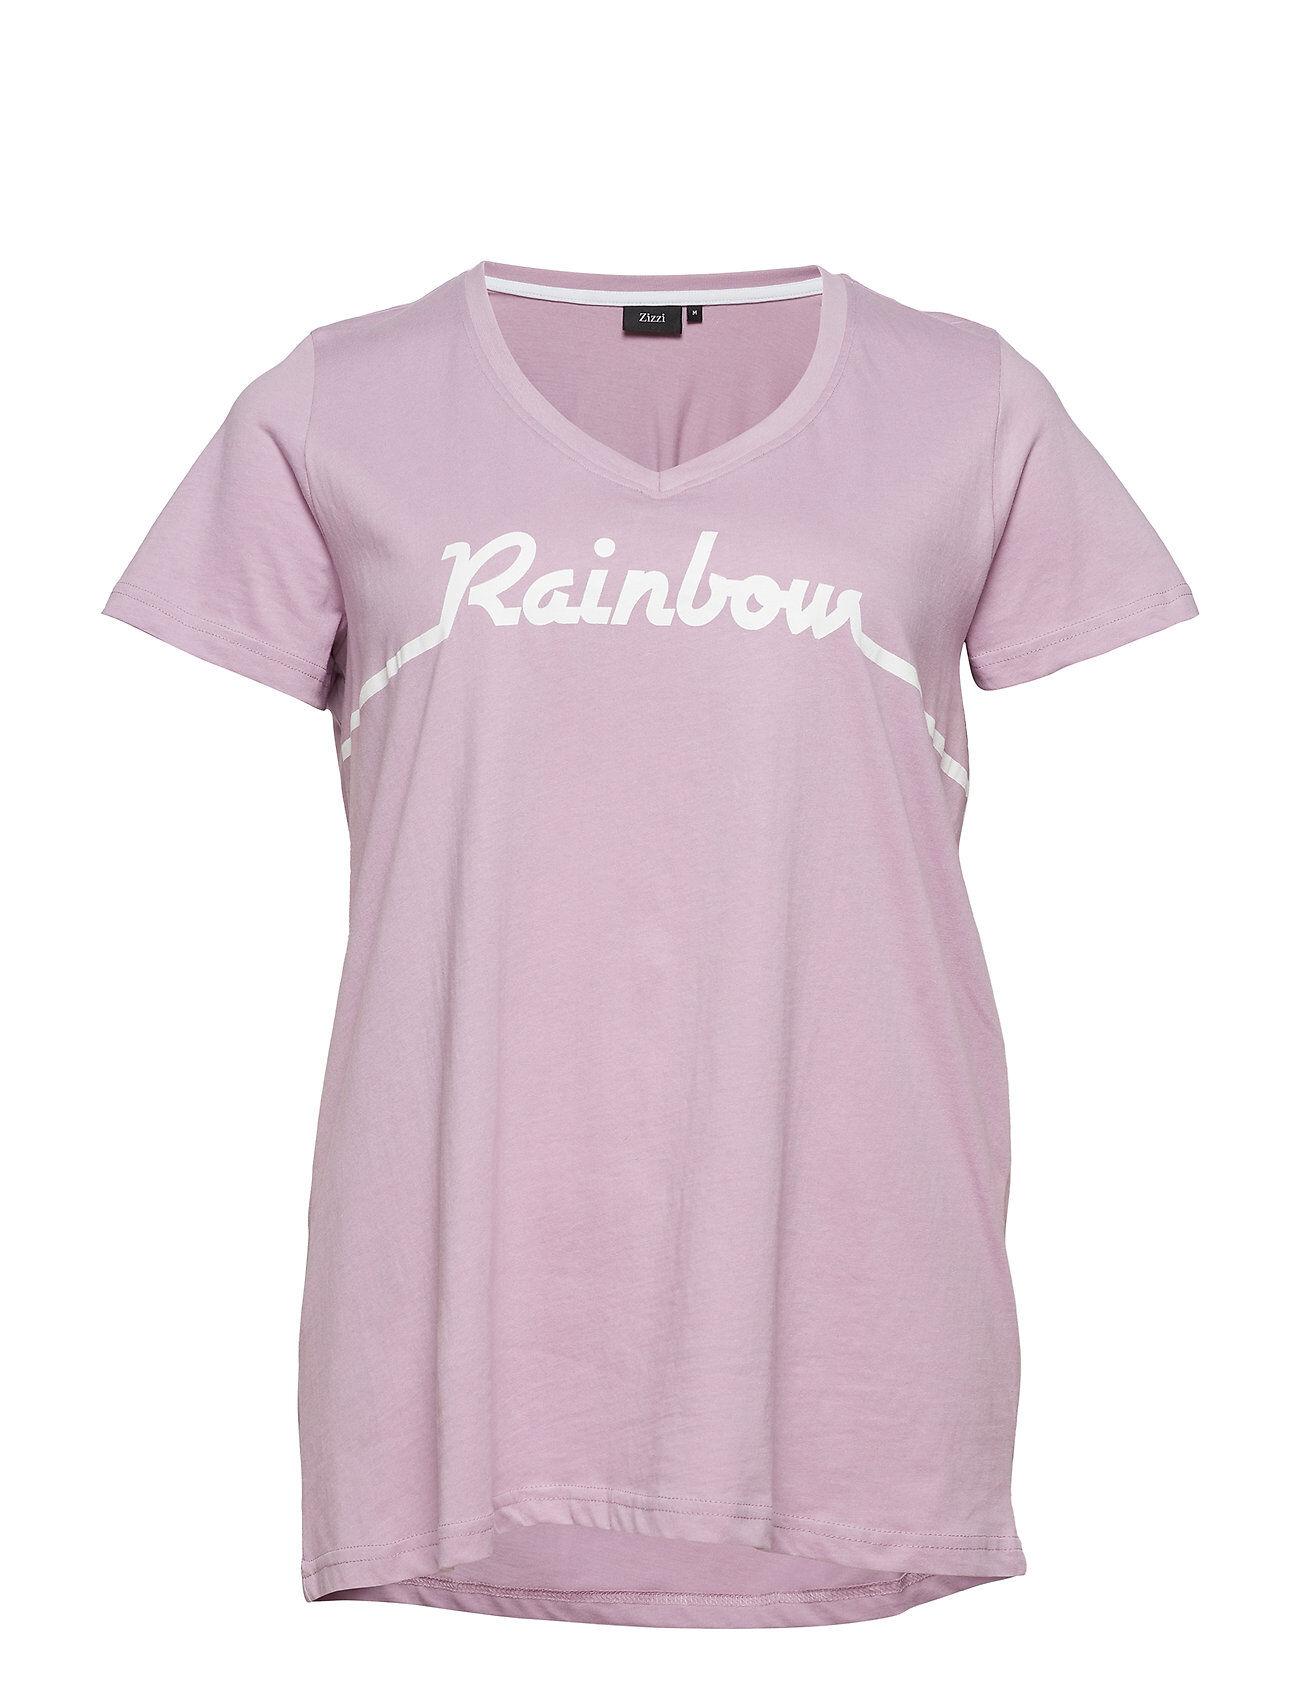 Zizzi Mstepahnie, S/S, T-Shirt